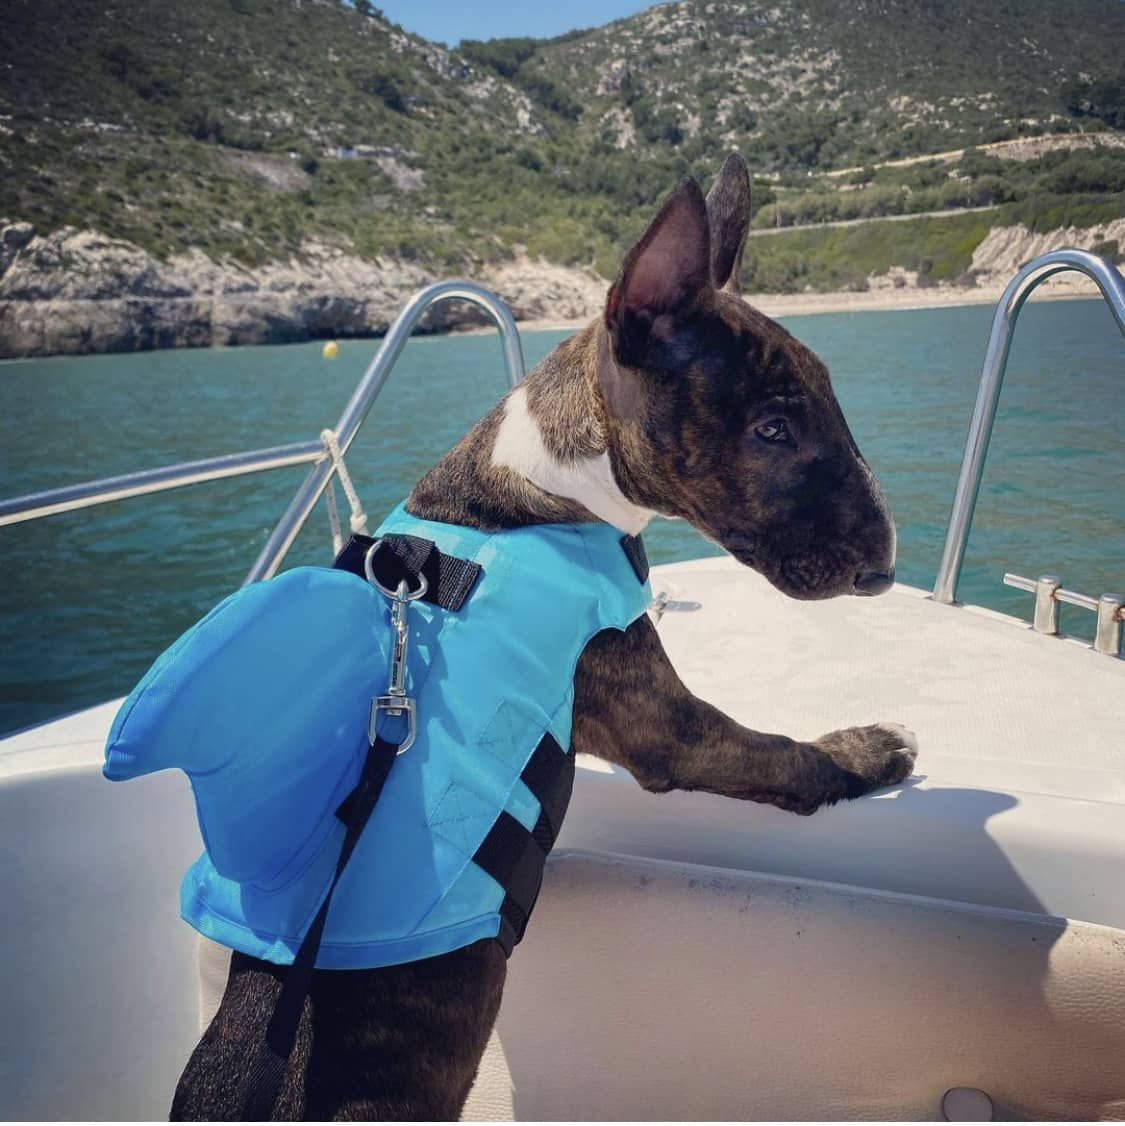 Consejos para enseñar a nadar a un perro bull terrier mini